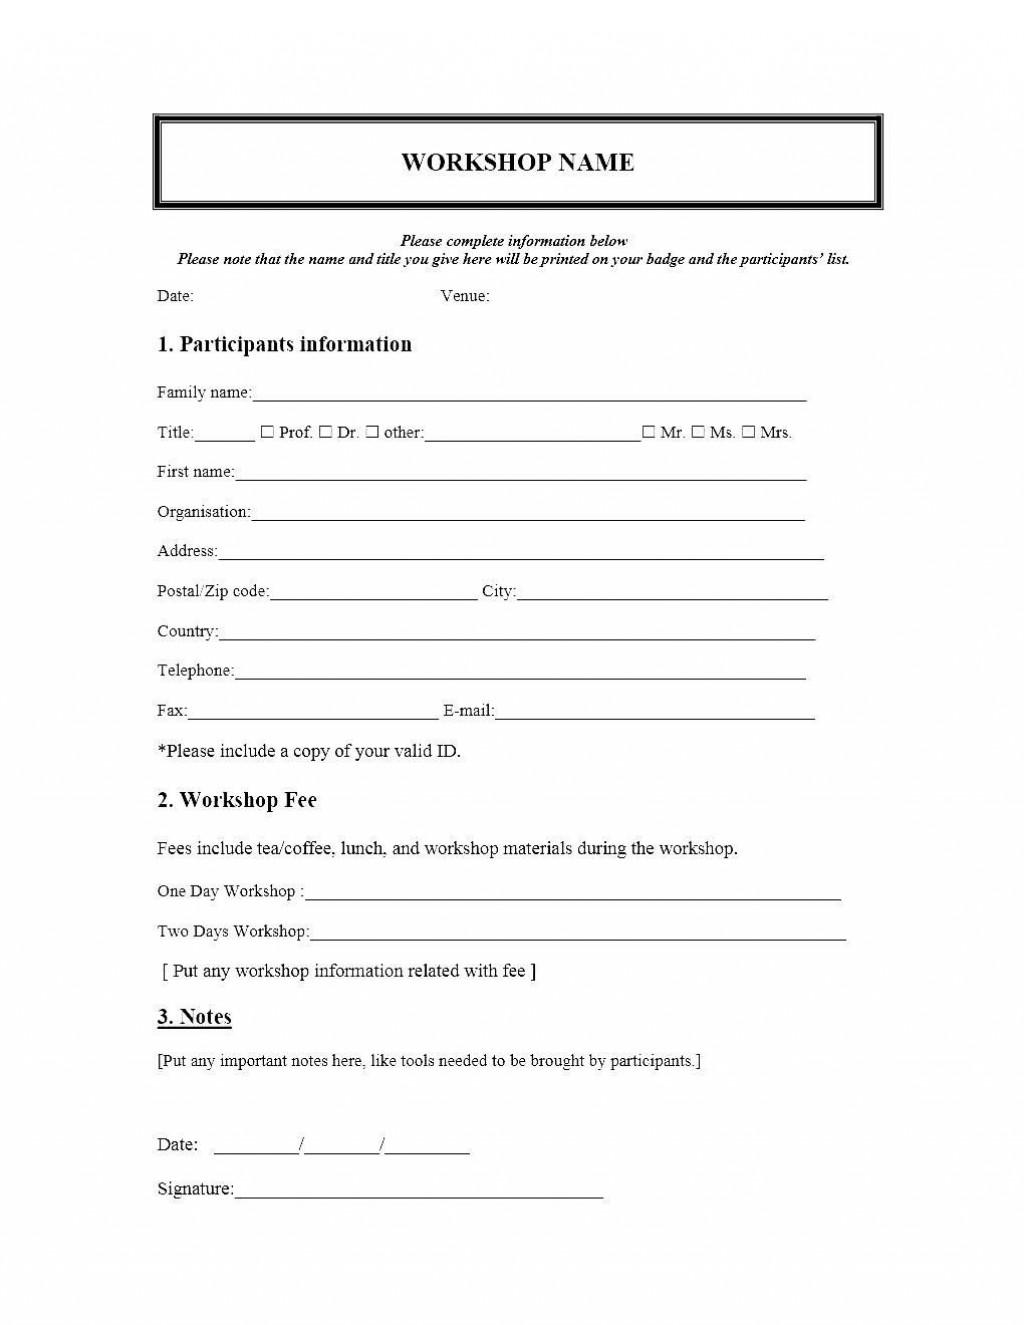 007 Stupendou Registration Form Template Word Image  Conference FreeLarge